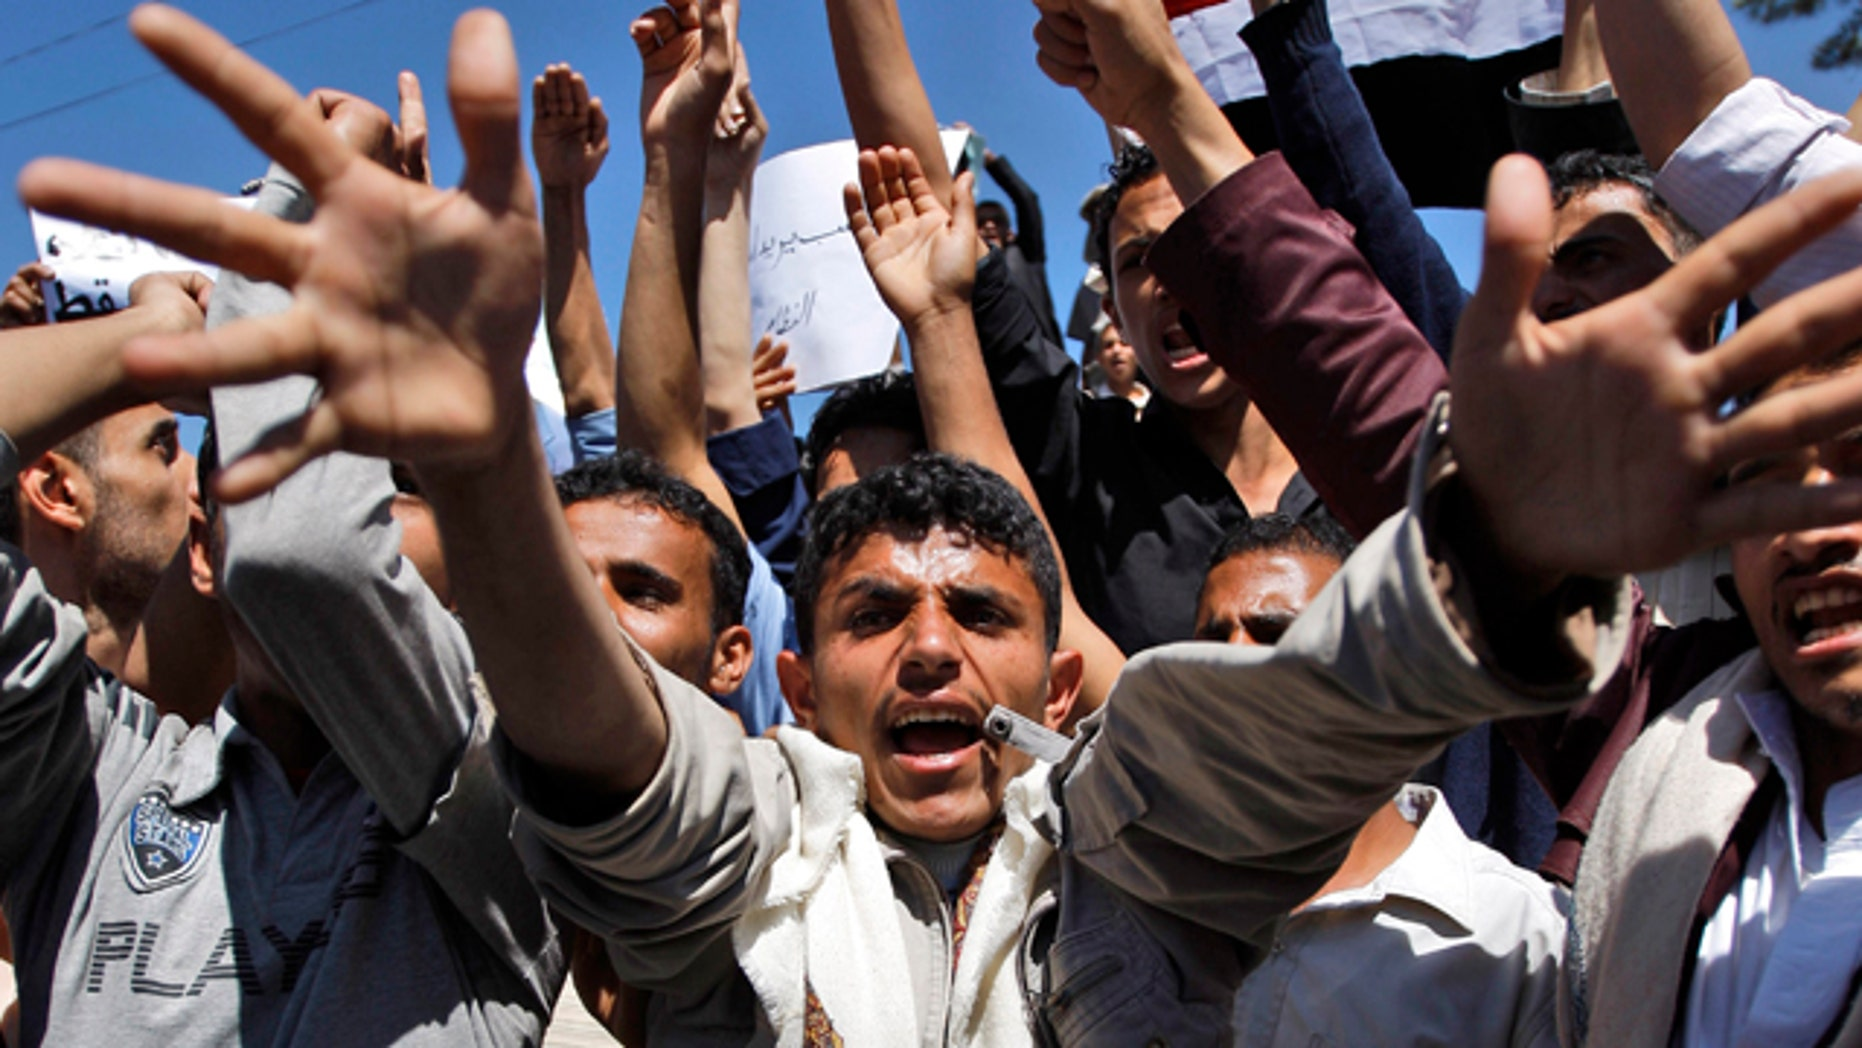 Feb. 14: Yemeni anti-government protestors shout slogans during a demonstration demanding political reform and the resignation of President Ali Abdullah Saleh in Sanaa, Yemen.